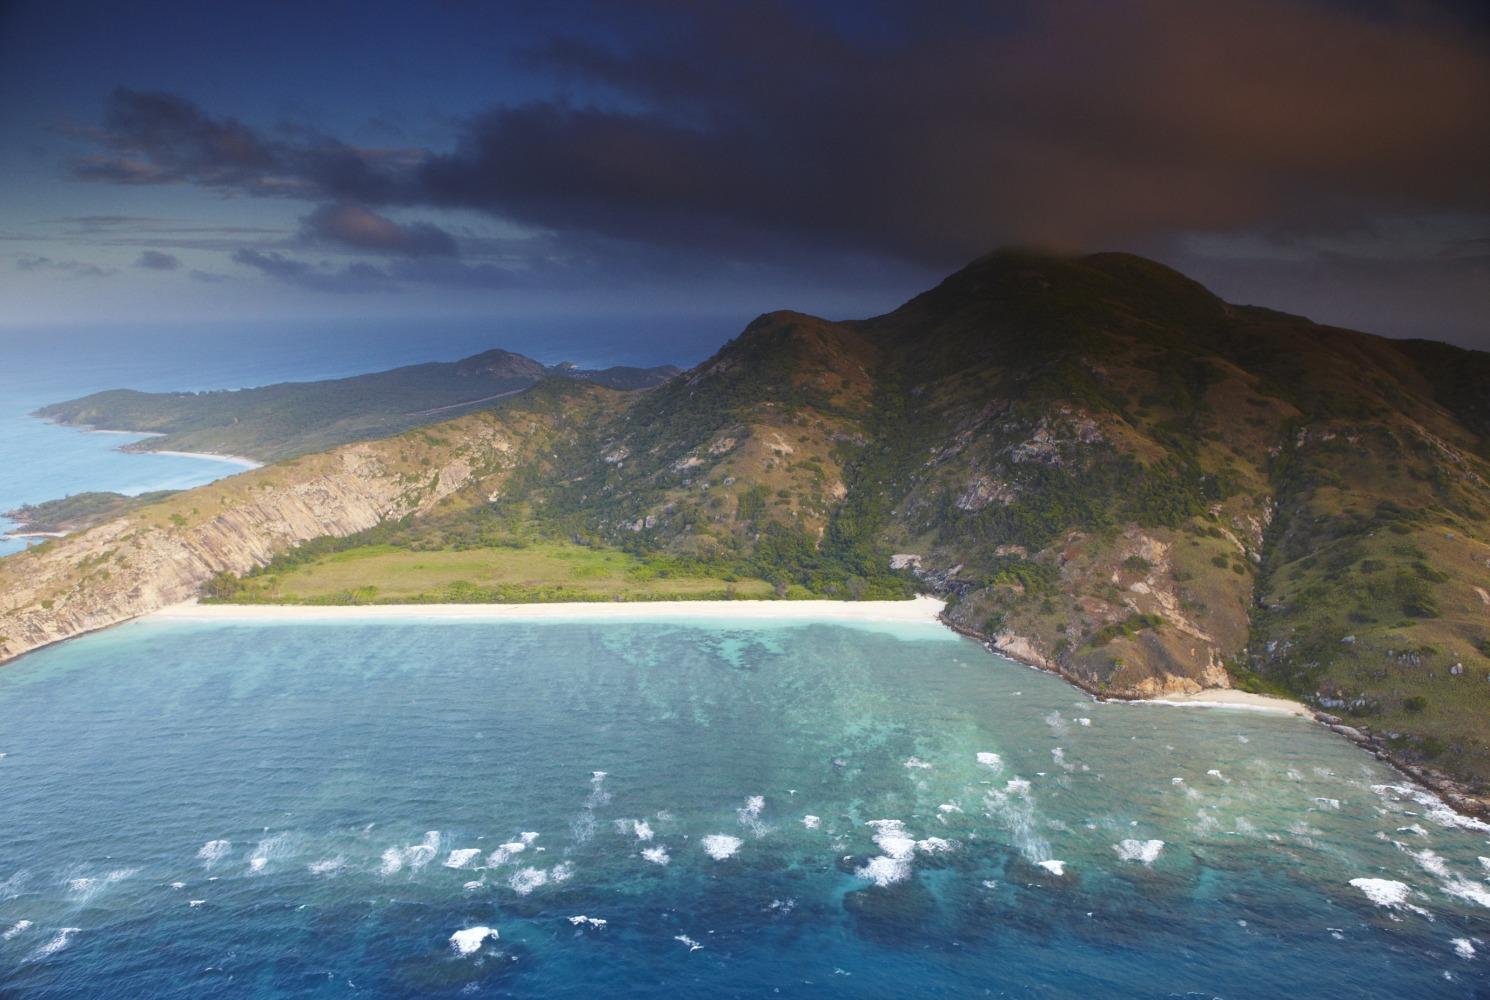 Private Islands for rent - Lizard Island - Australia ...